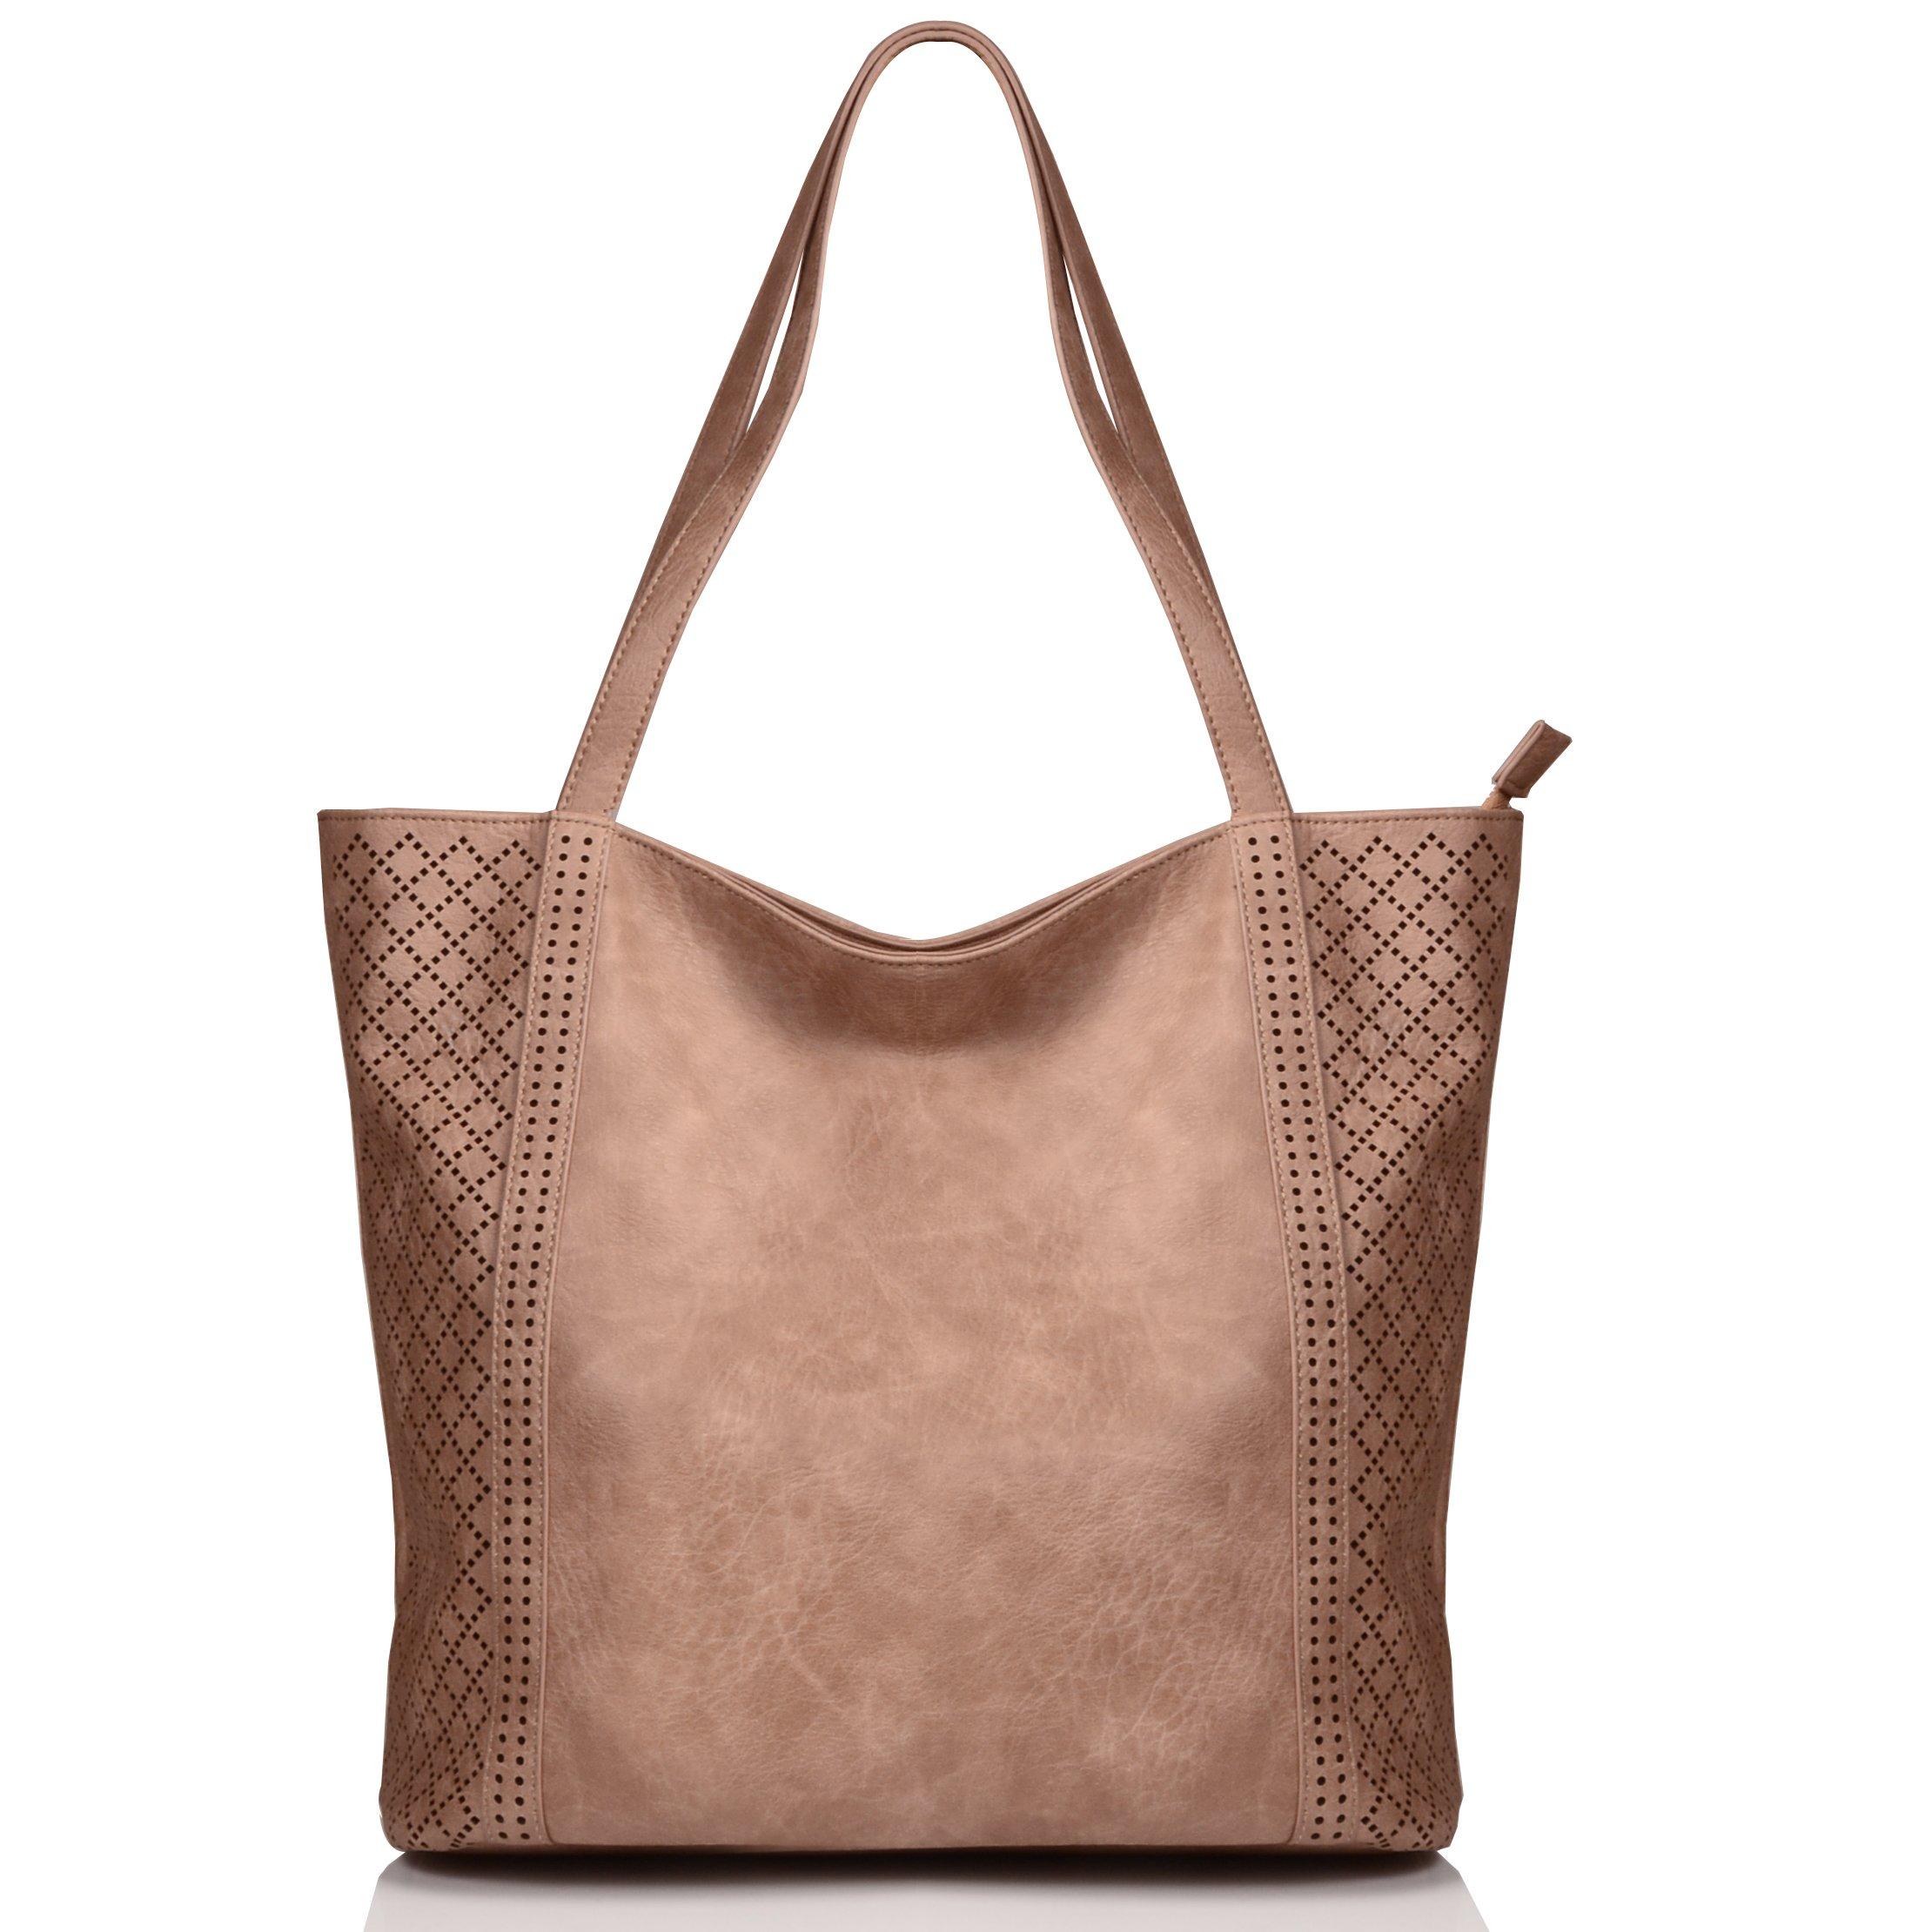 KISS GOLD(TM) Womens Top Handle Bag, Large Capacity Shoulder Handbag Shopping Bag with Exquisite Hollow Design